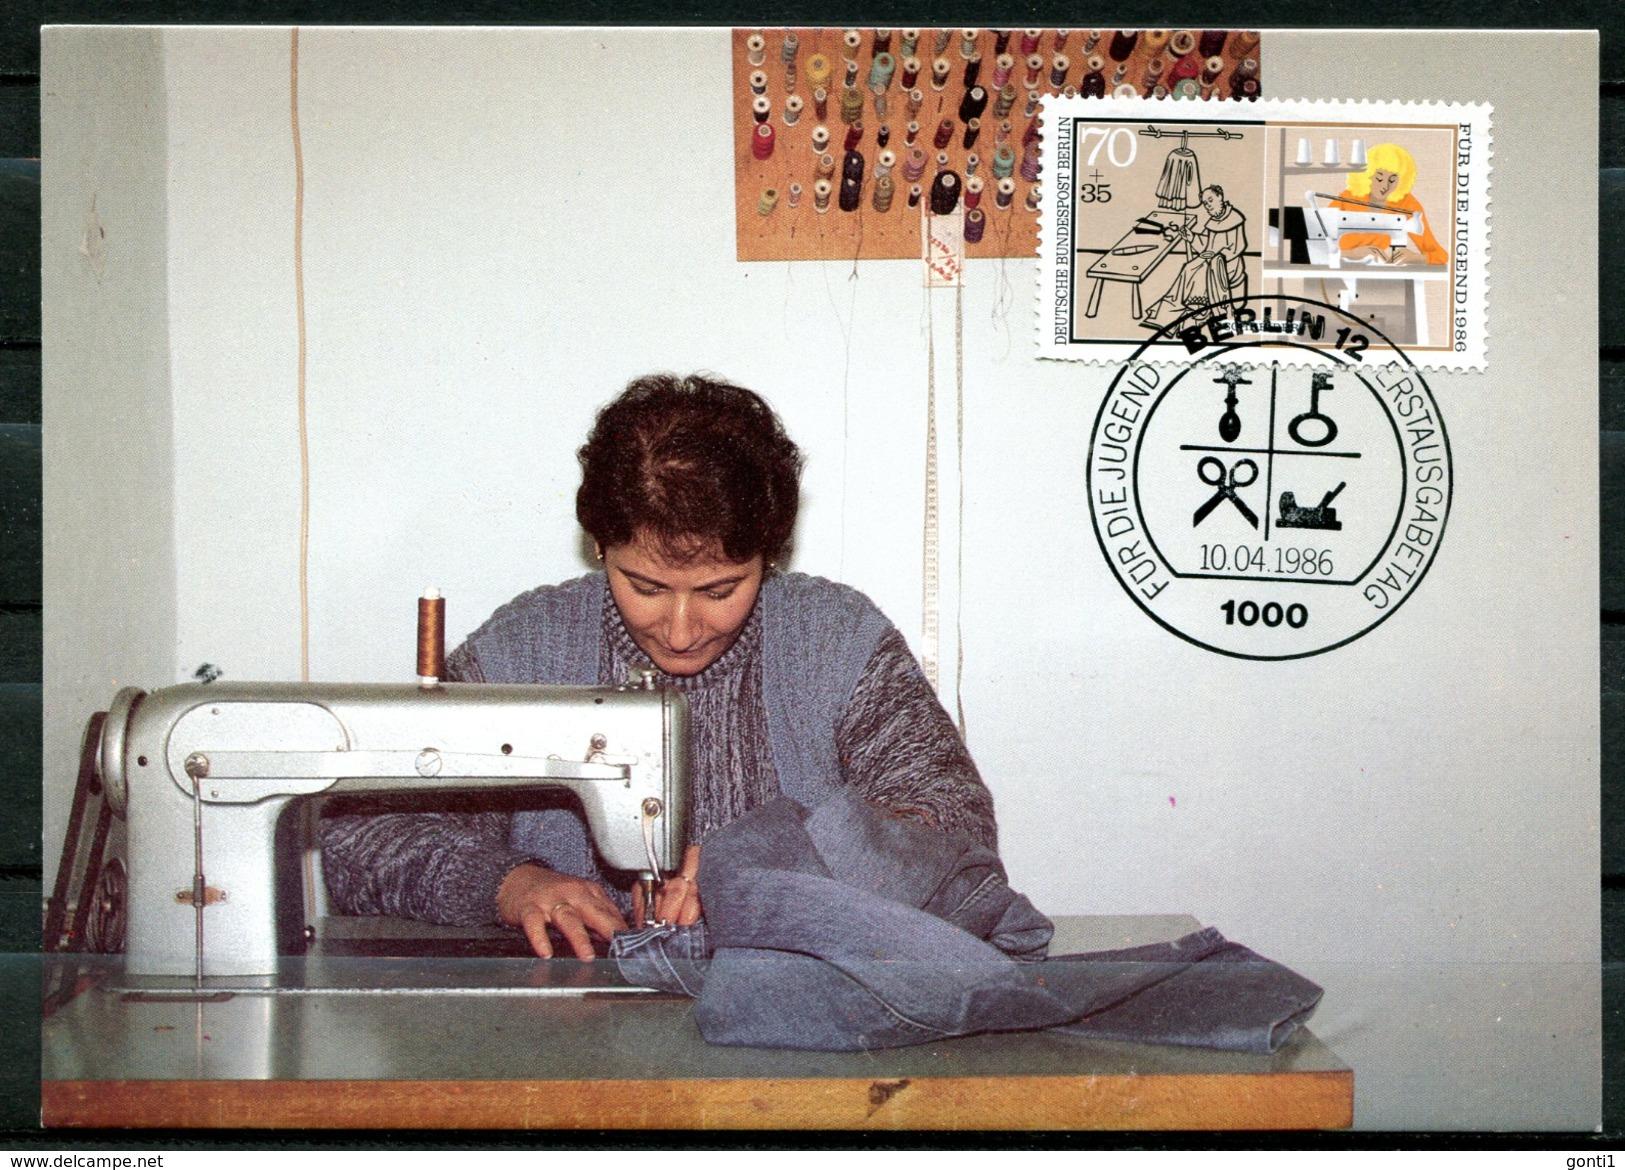 "Germany,Westberlin 1986 Maxicart,MC Mi.Nr.756""Handwerksberufe,Schneider,Näherin,Jugendmarke"" 1MK Used - Fabriken Und Industrien"